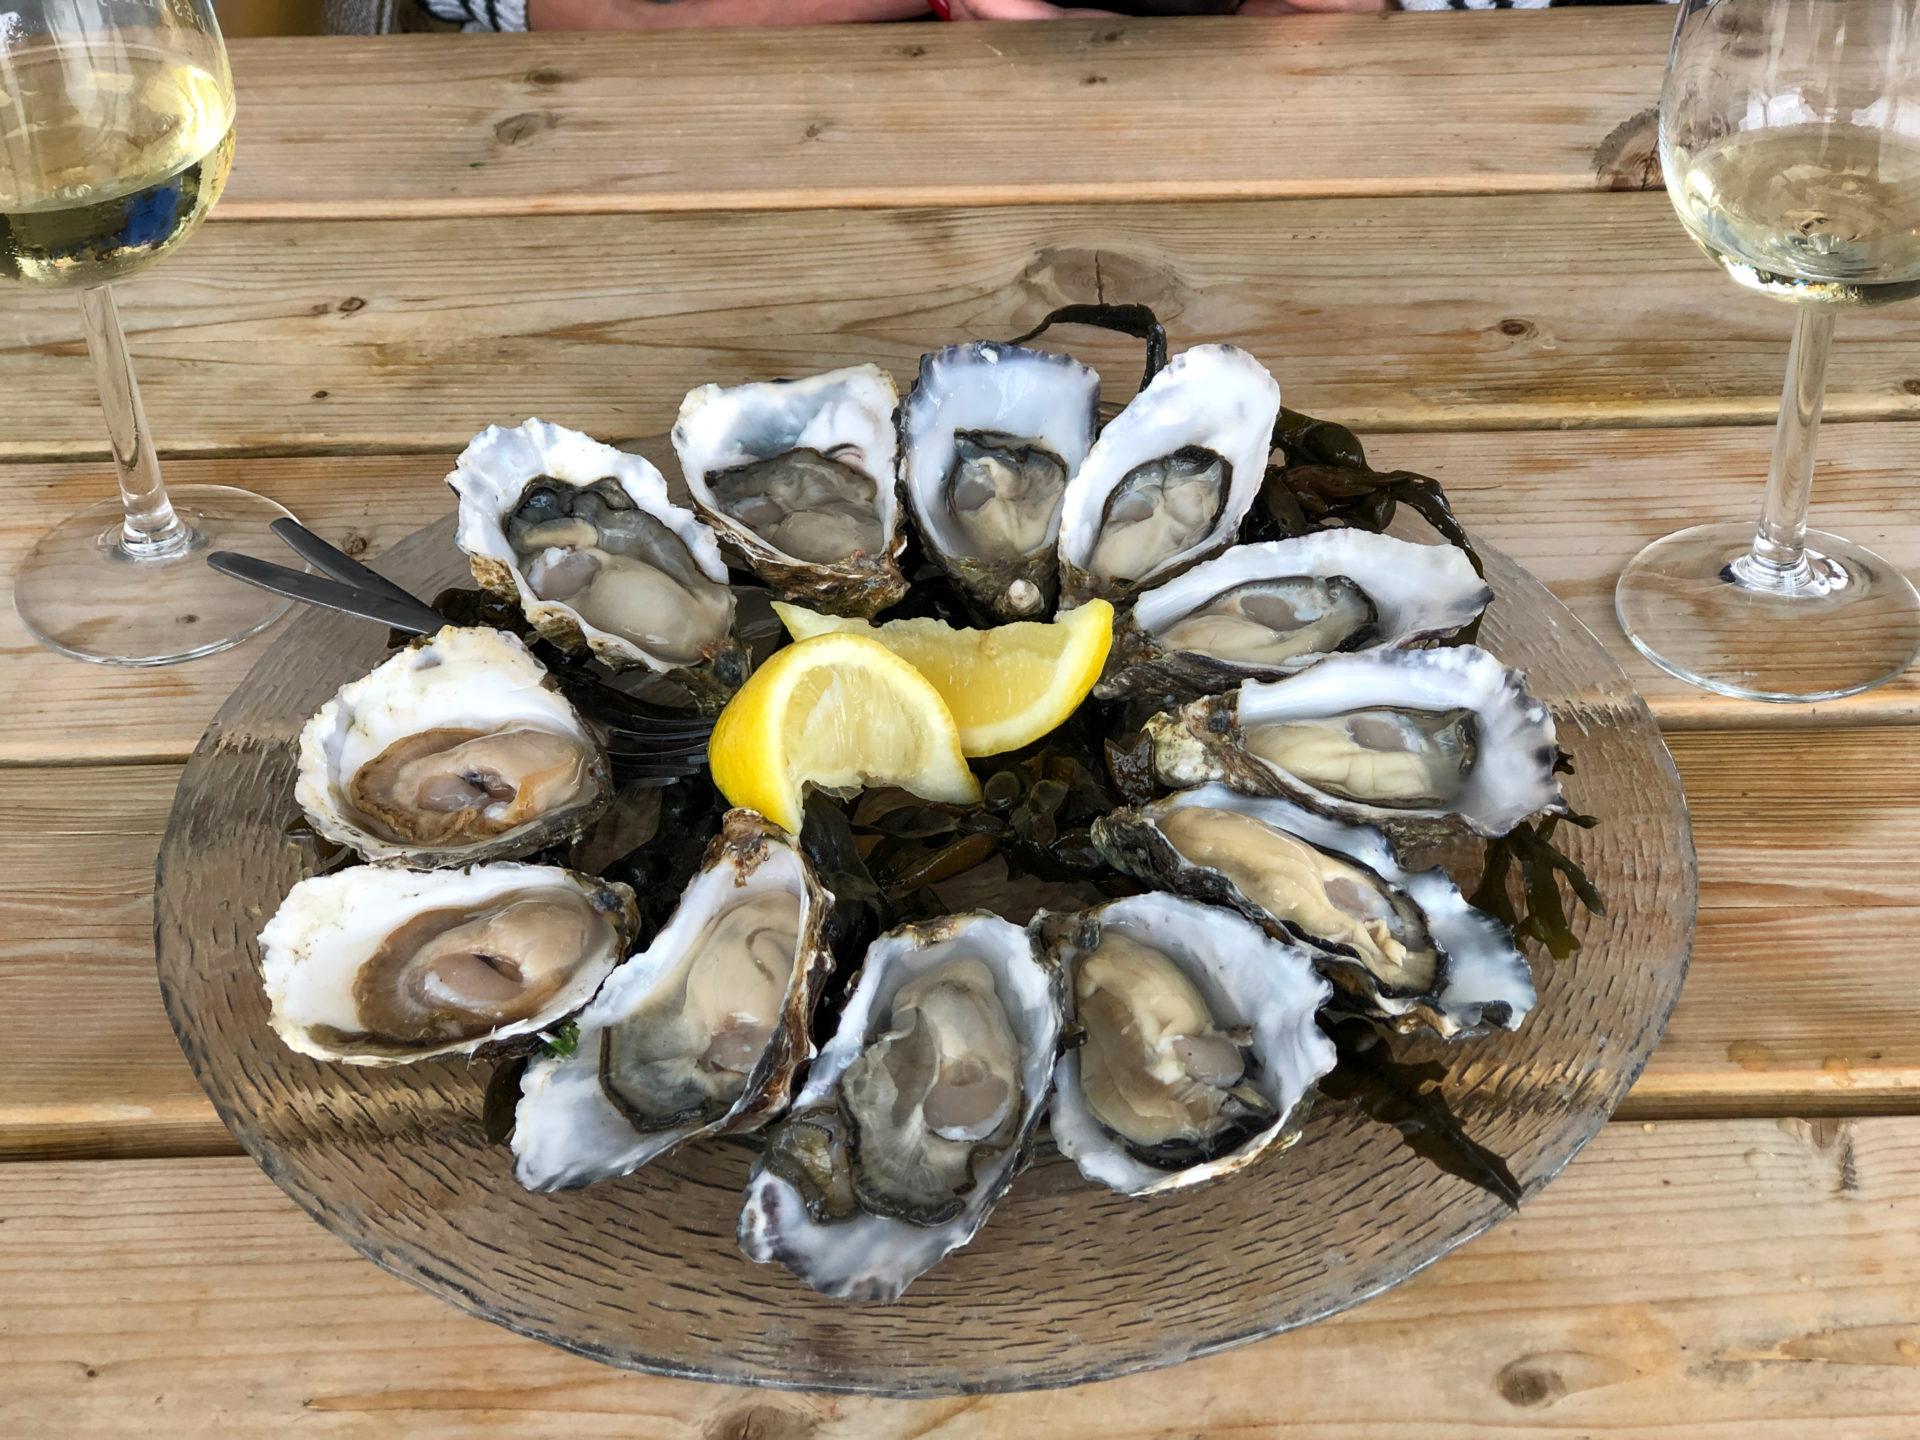 Austernplatte in der Oesterij in Zeeland mit Wein